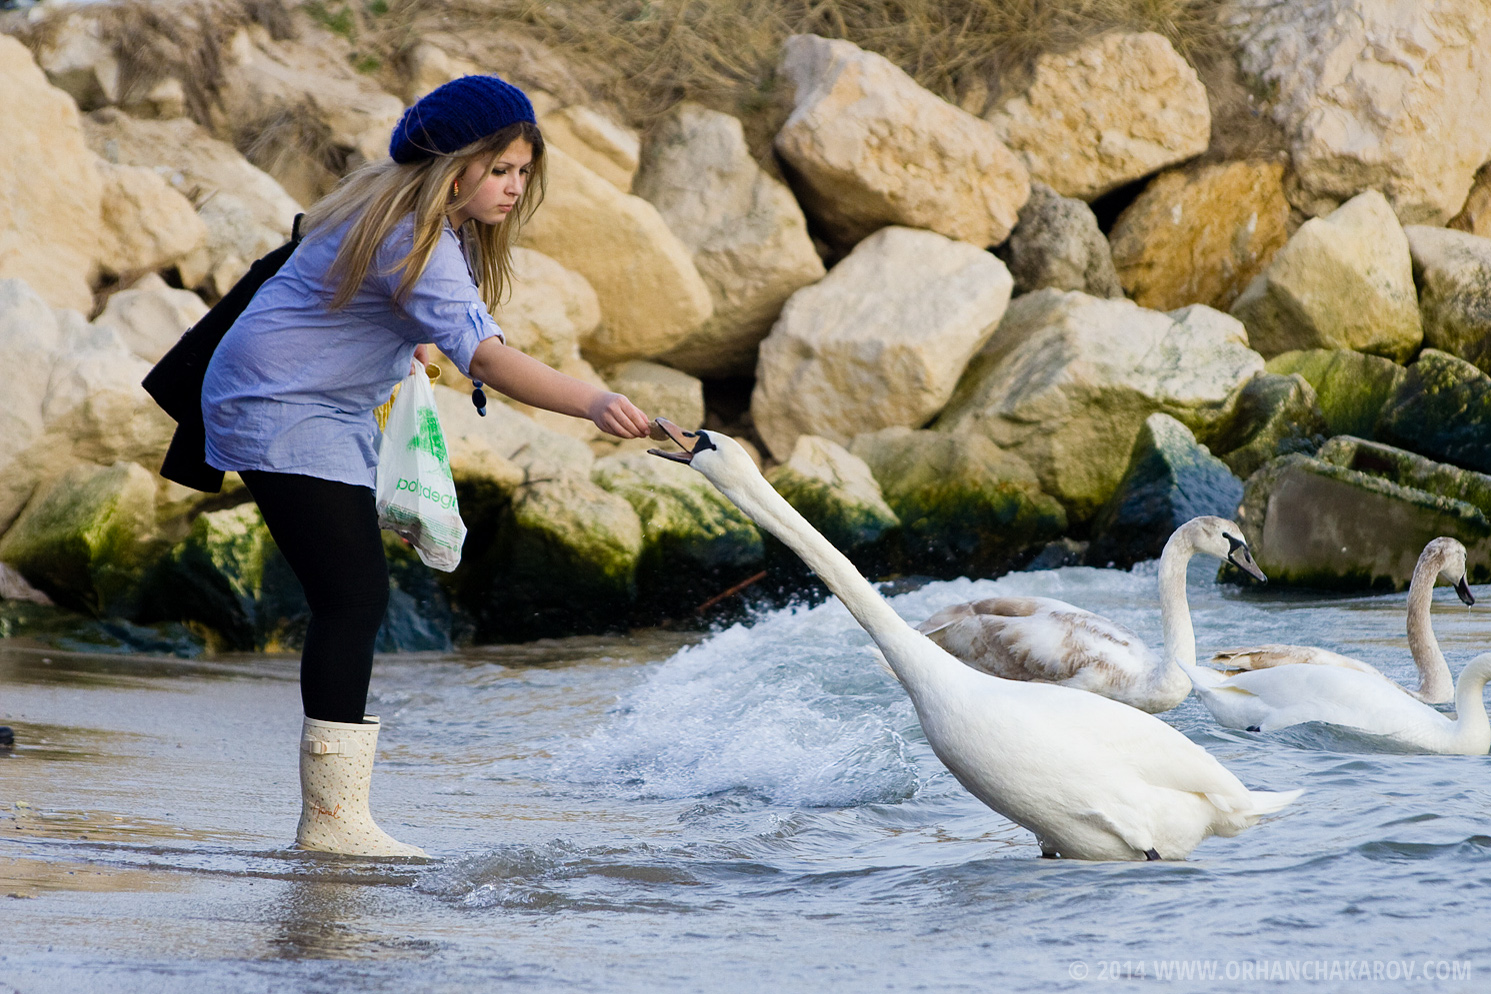 Момиче на плажа във Варна. Фотограф - Орхан Чакъров, град Варна